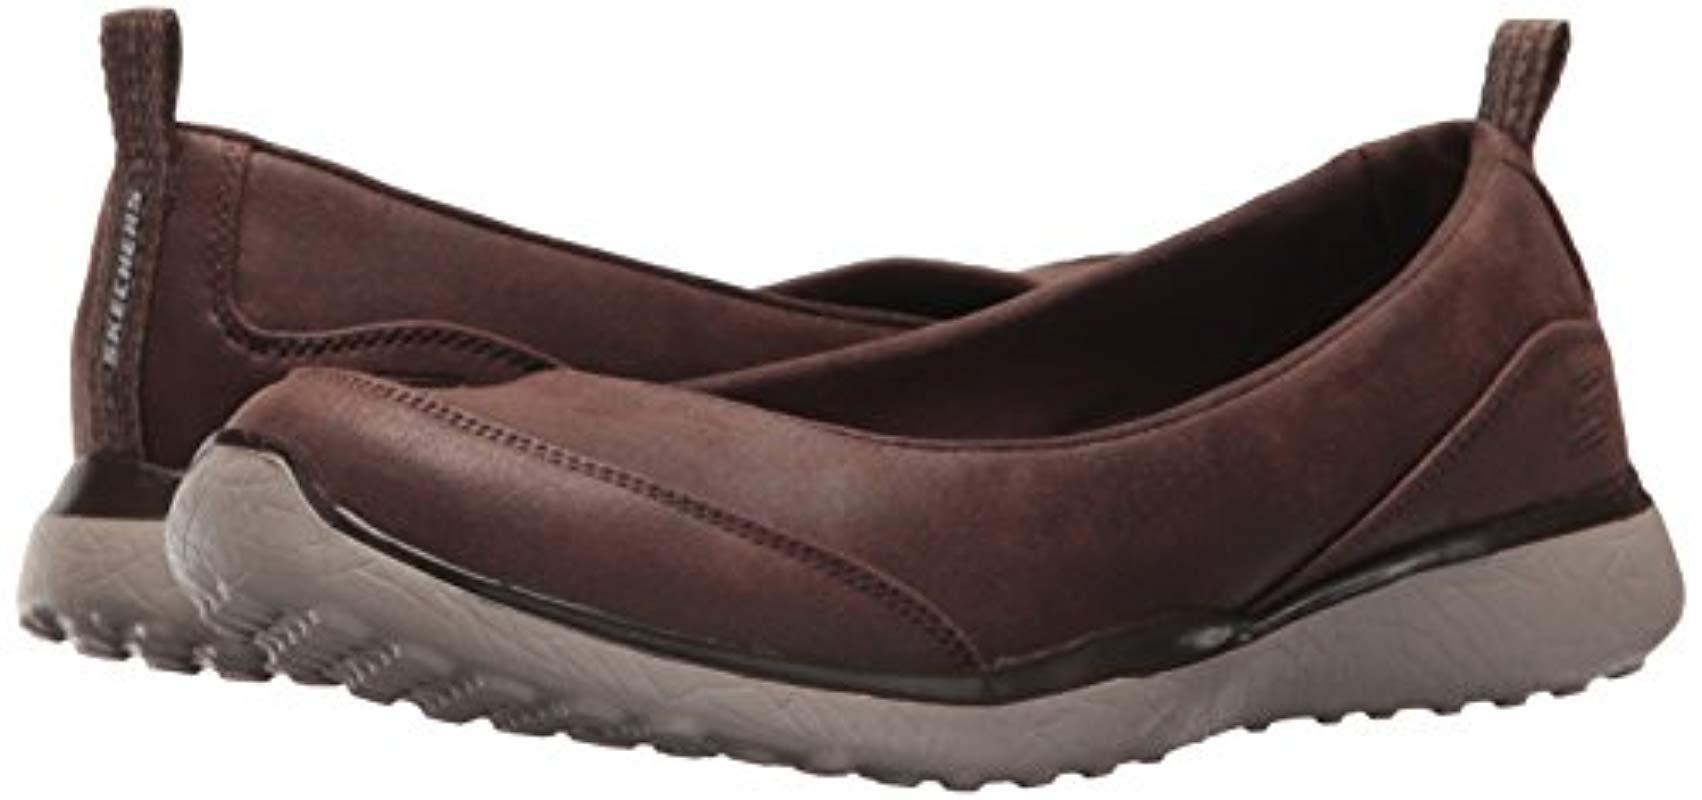 Skechers Microburst Lightness Sneaker in Brown